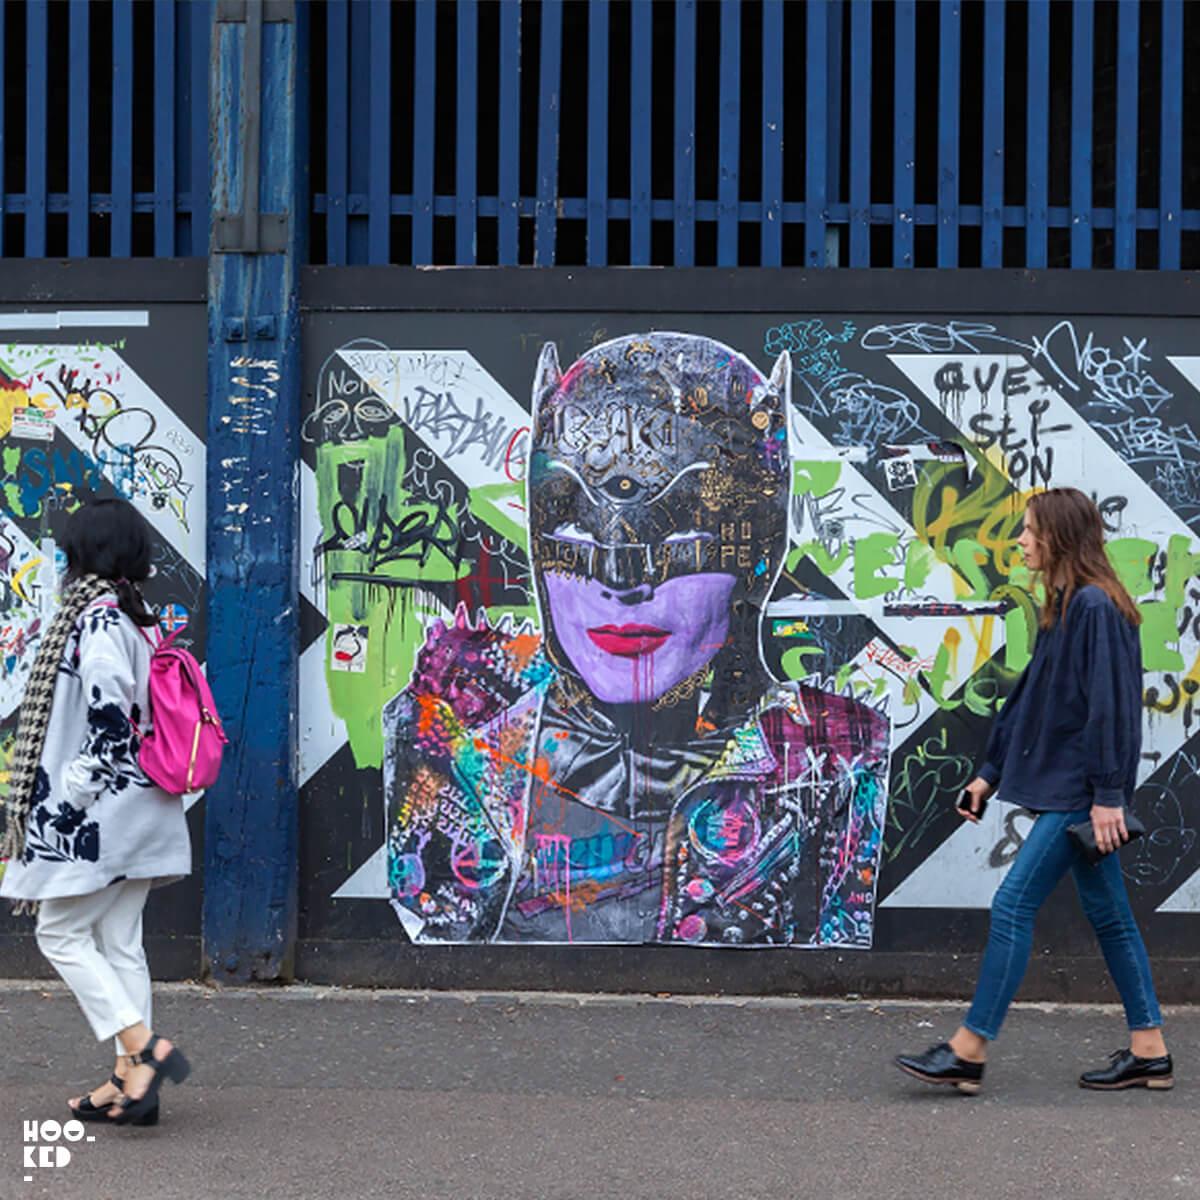 Five London Street Art Hotspots for Paste-ups - Stikki Peaches